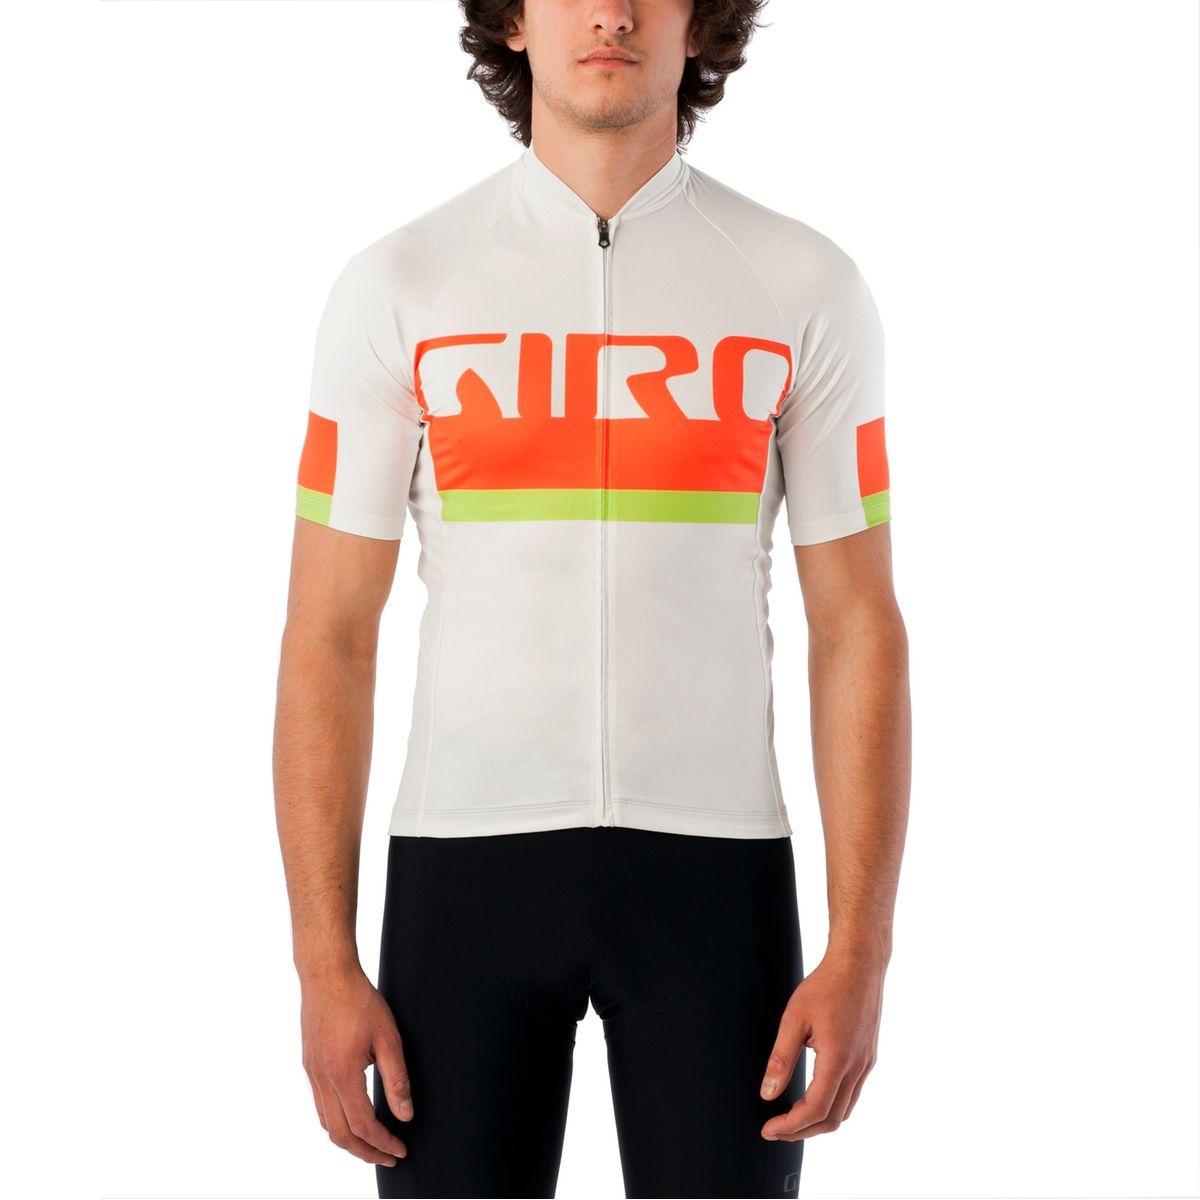 Chrono Expert - Maillot manches courtes Homme - orange/blanc